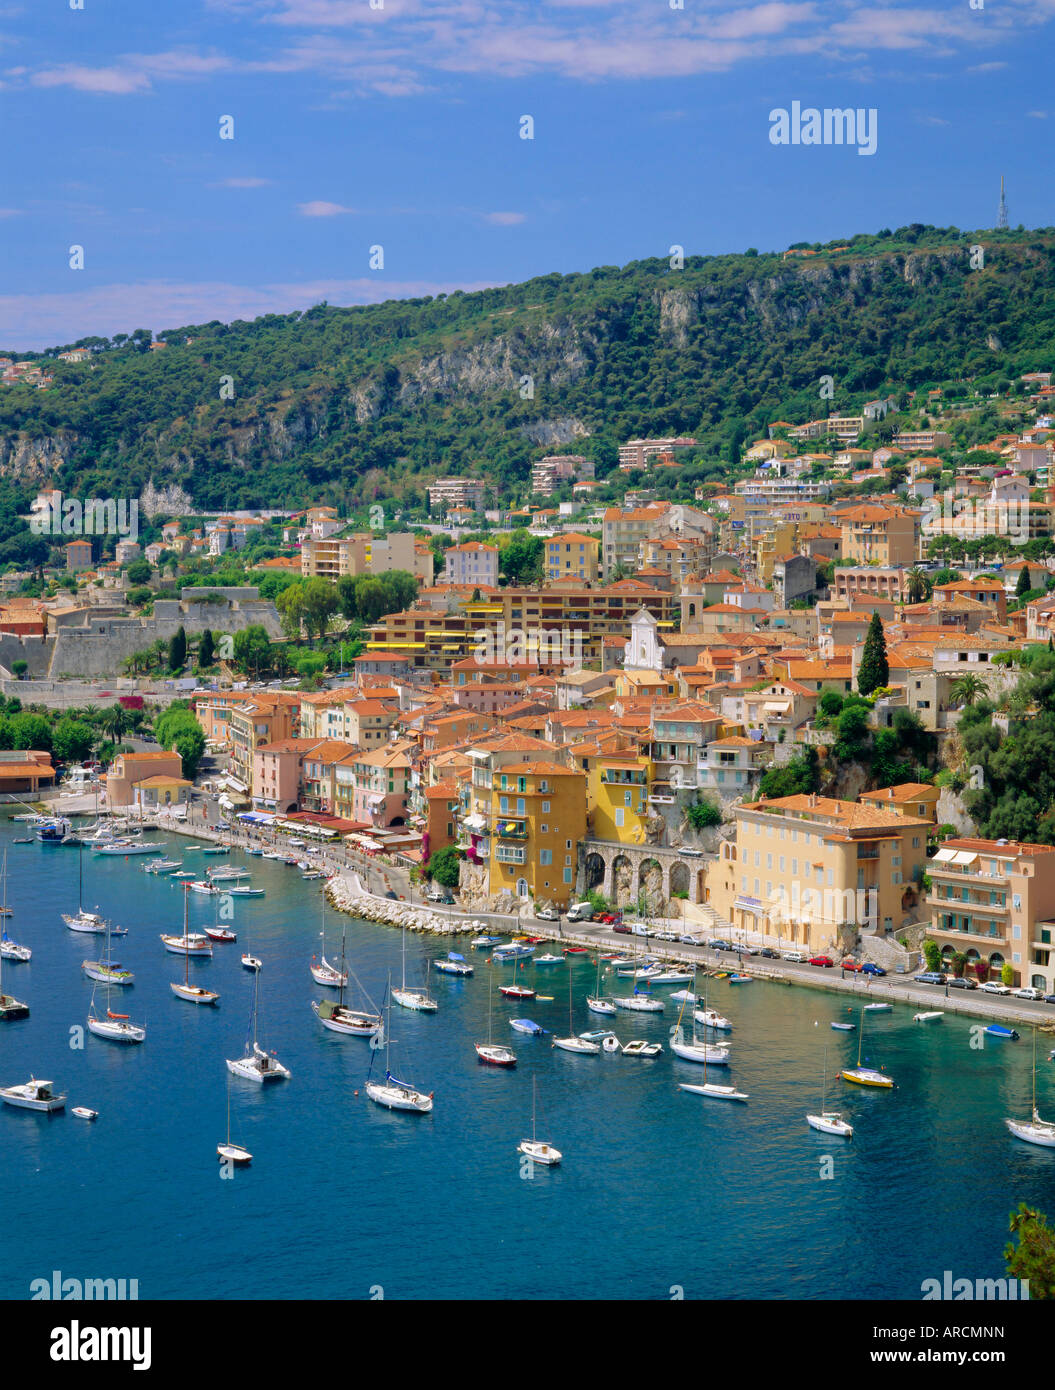 Villefranche, Cote d'Azur, Provence, France, Europe - Stock Image